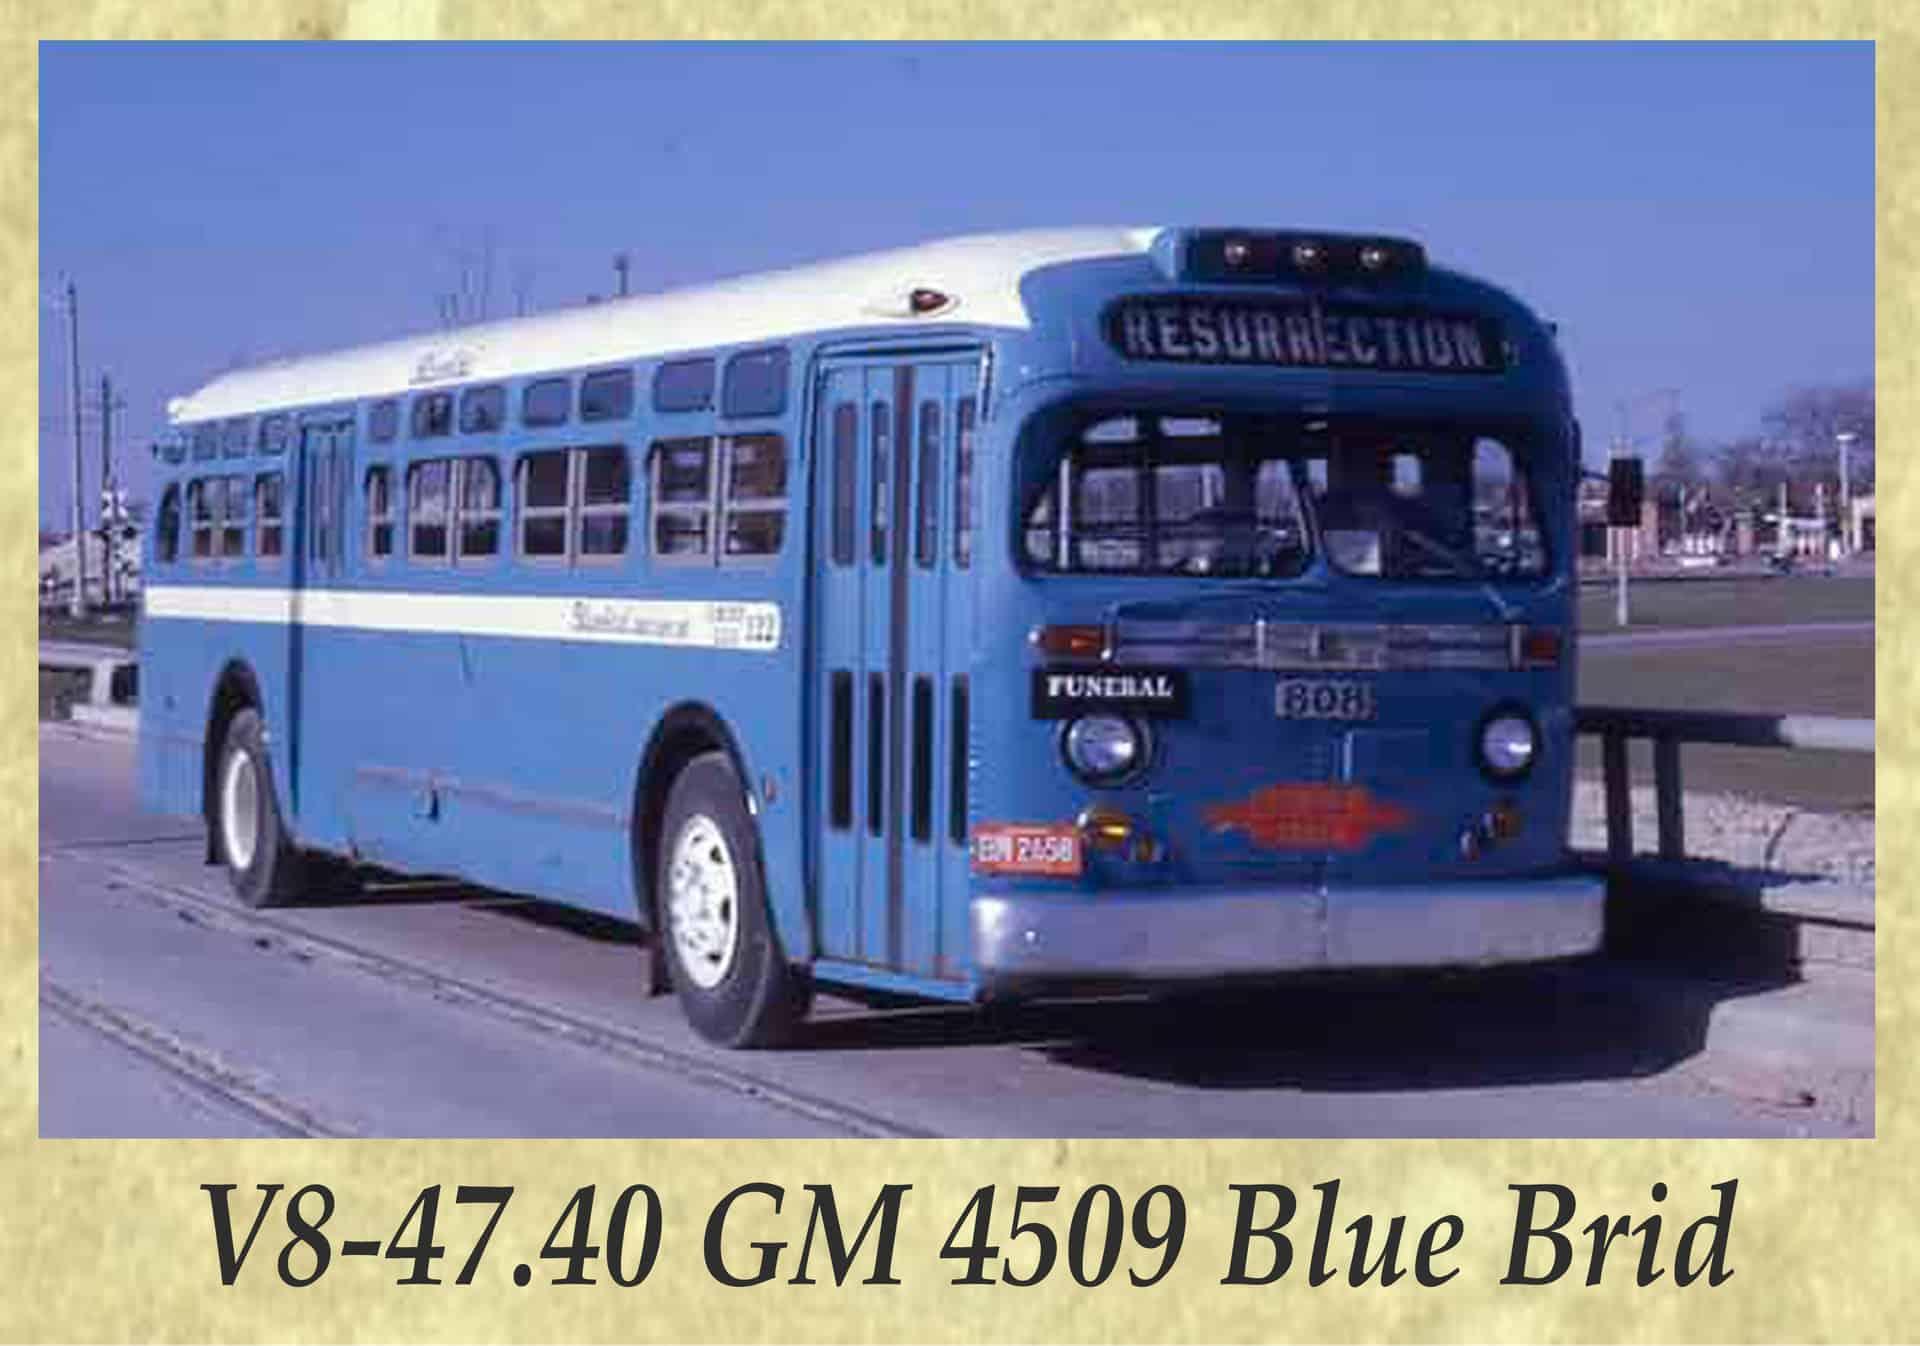 V8-47.40 GM 4509 Blue Brid